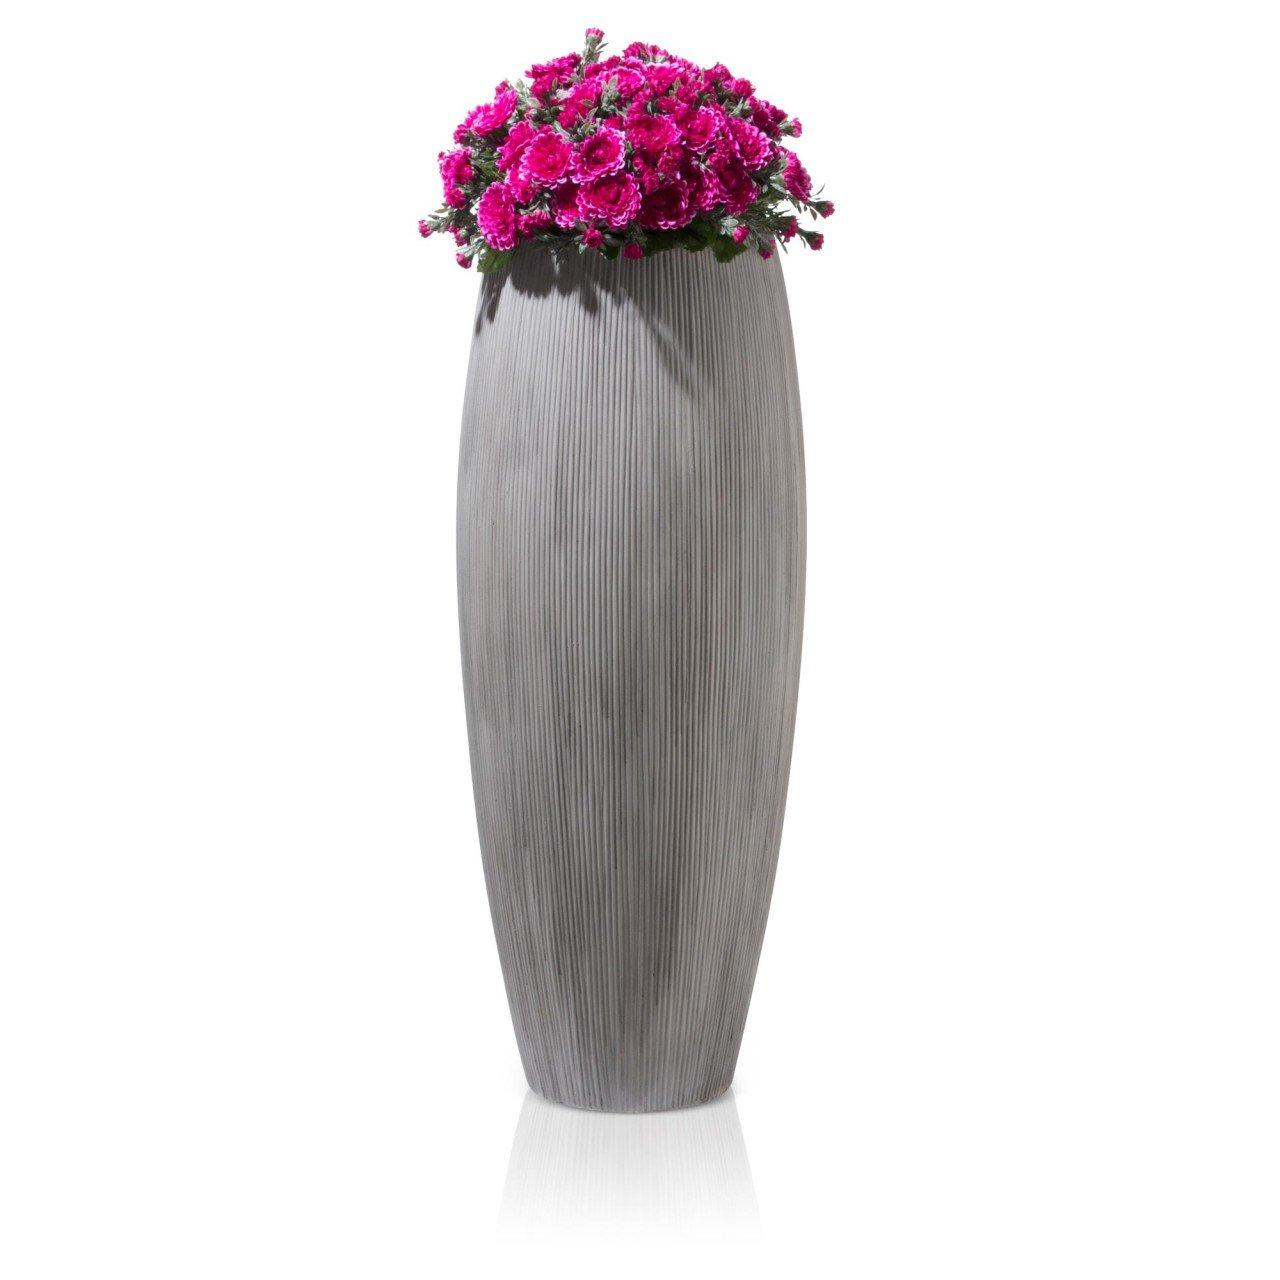 Blumenkübel Pflanzkübel CIGA 80 Fiberglas, 30x30x80 cm, grau ...